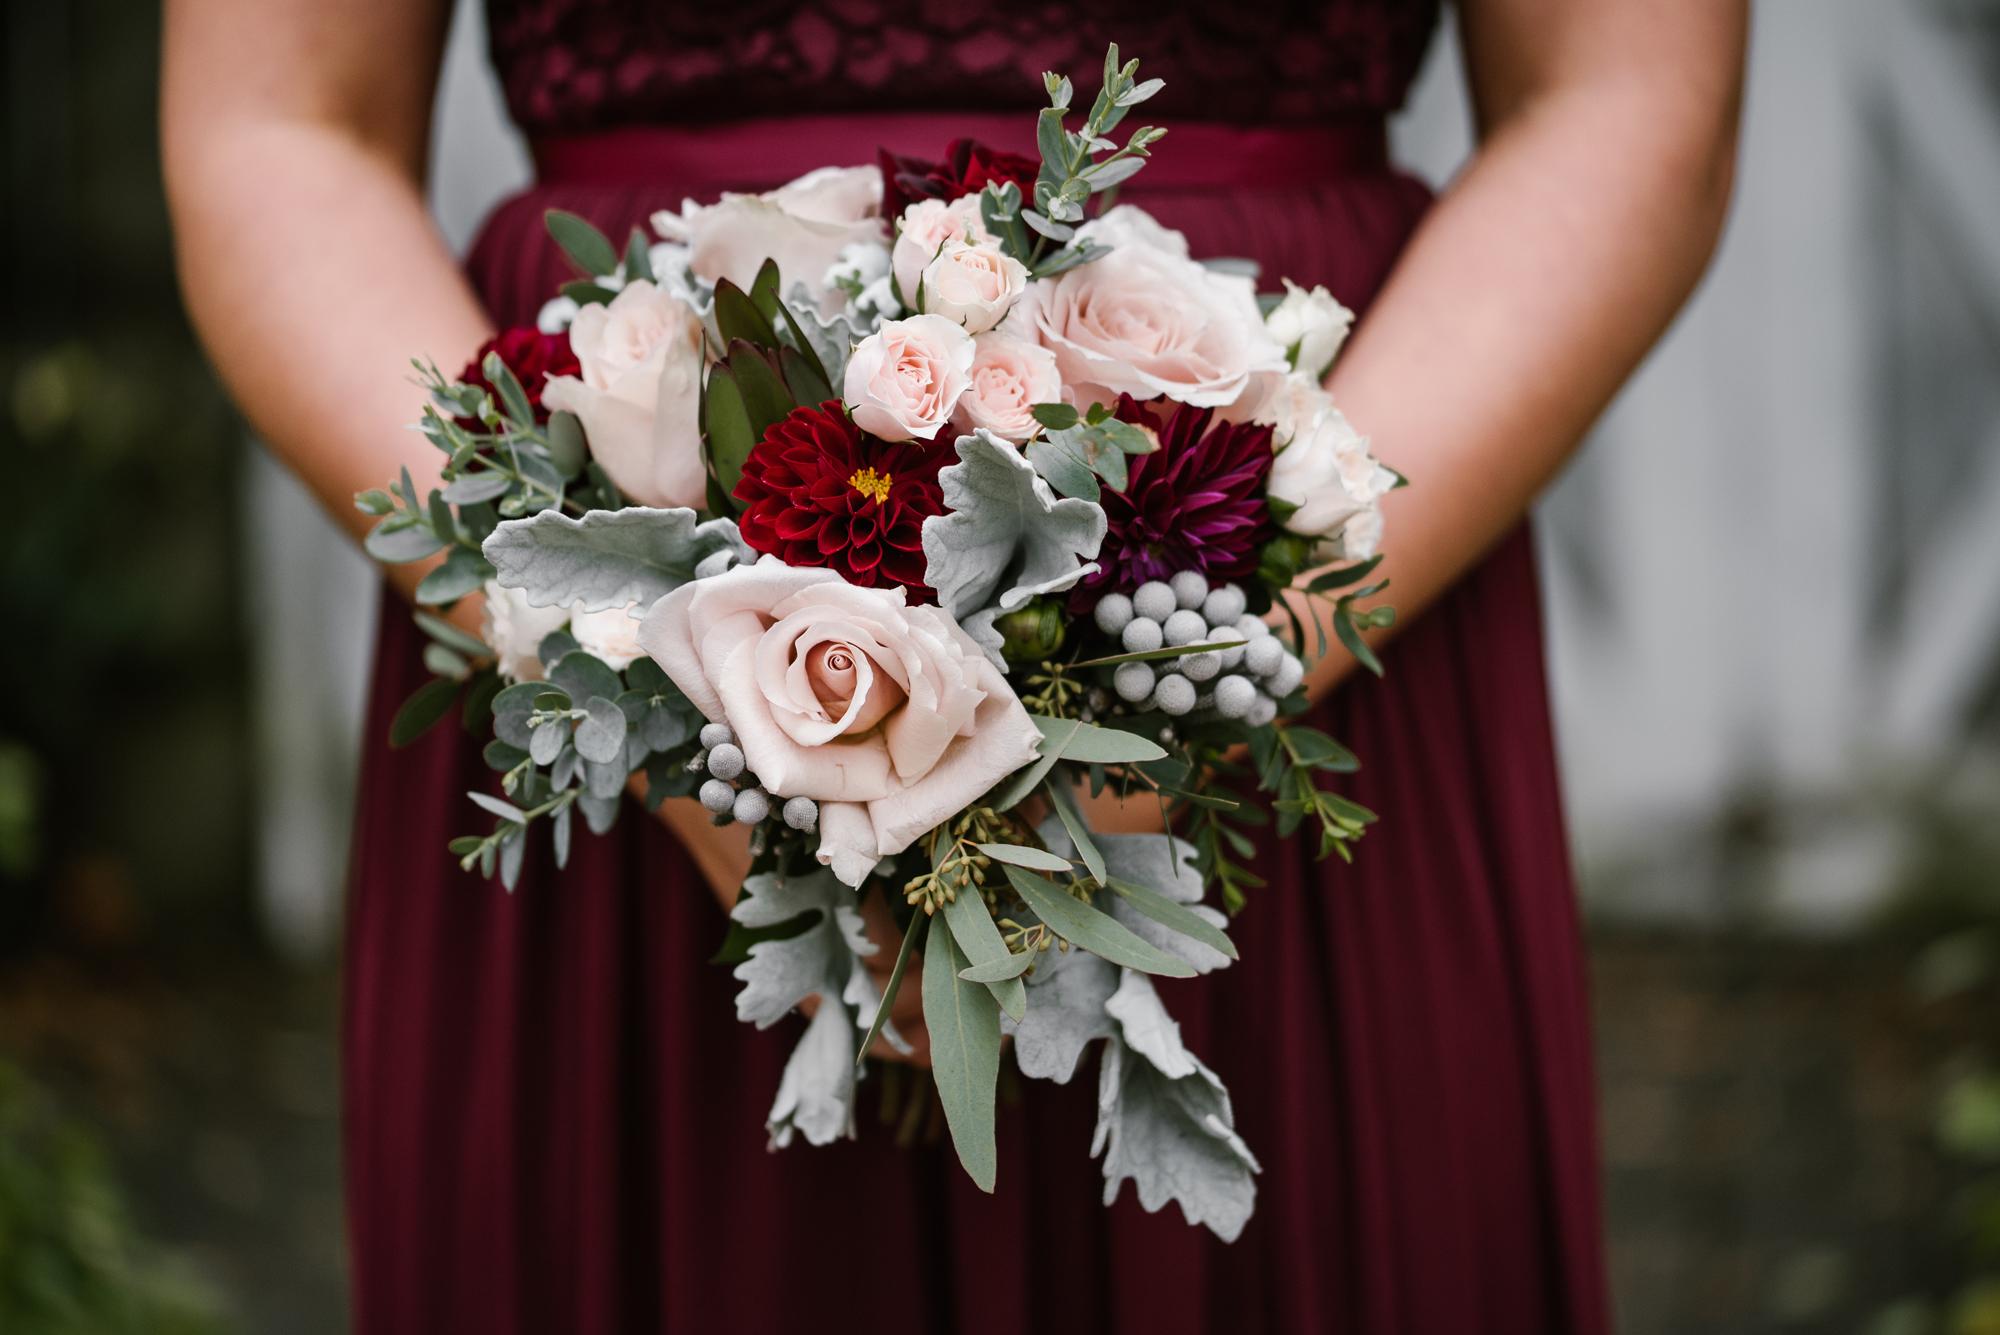 blue-dress-barn-benton-harbor-michigan-wedding-photographer (6).jpg